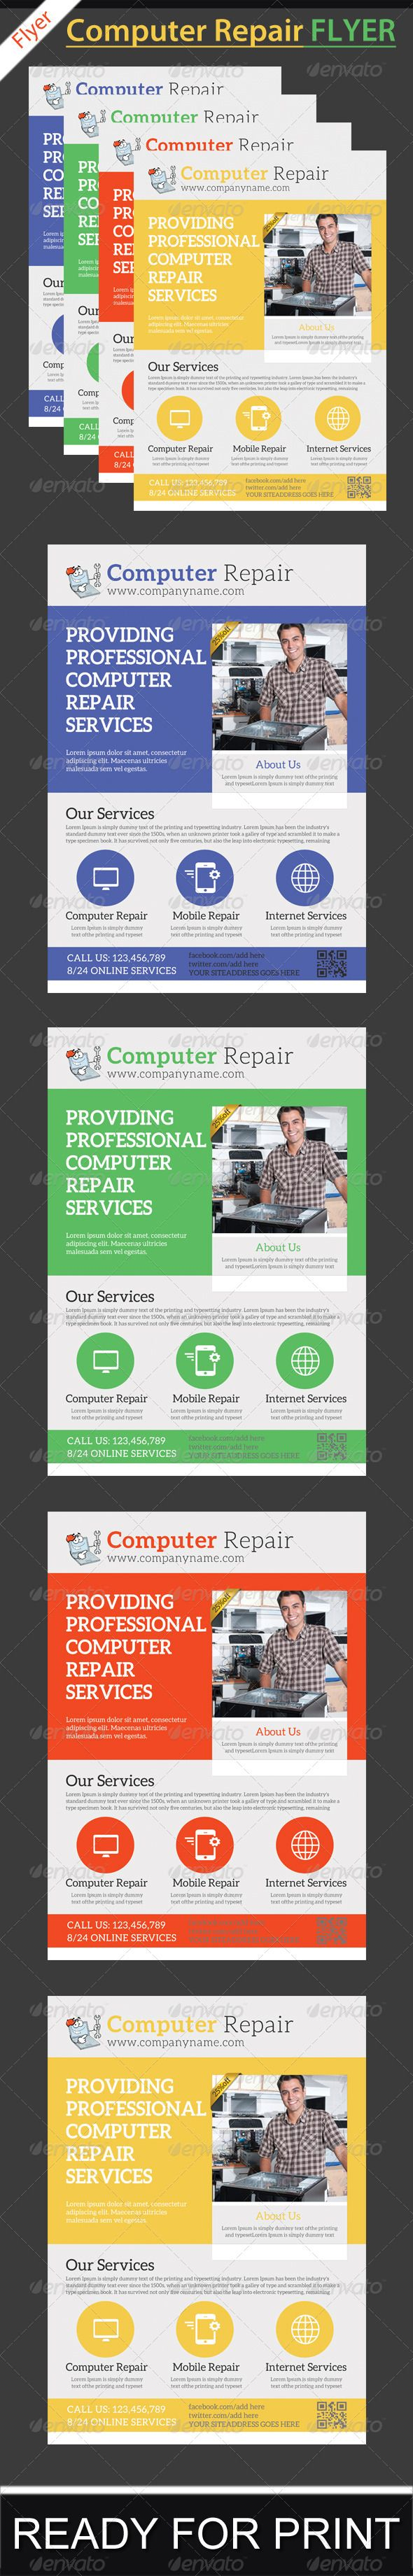 Computer Repair Service Flyer Template | Computer repair services ...